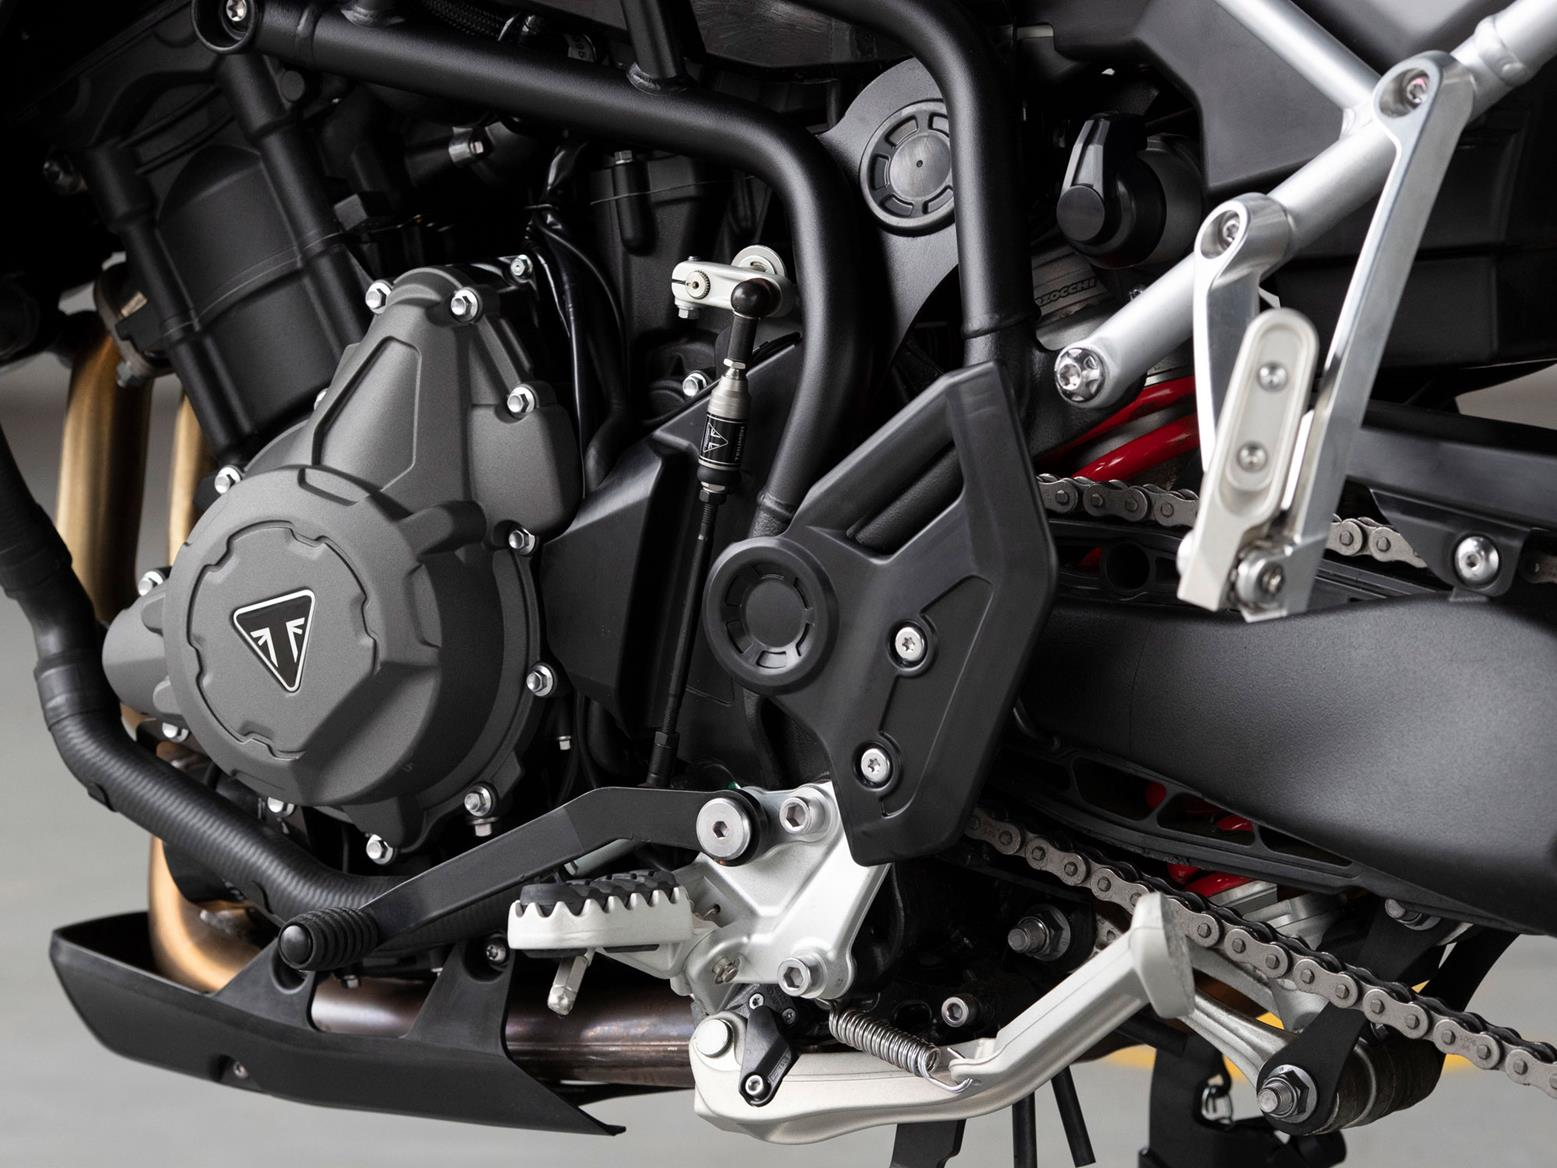 Triumph Tiger 900 GT Pro engine